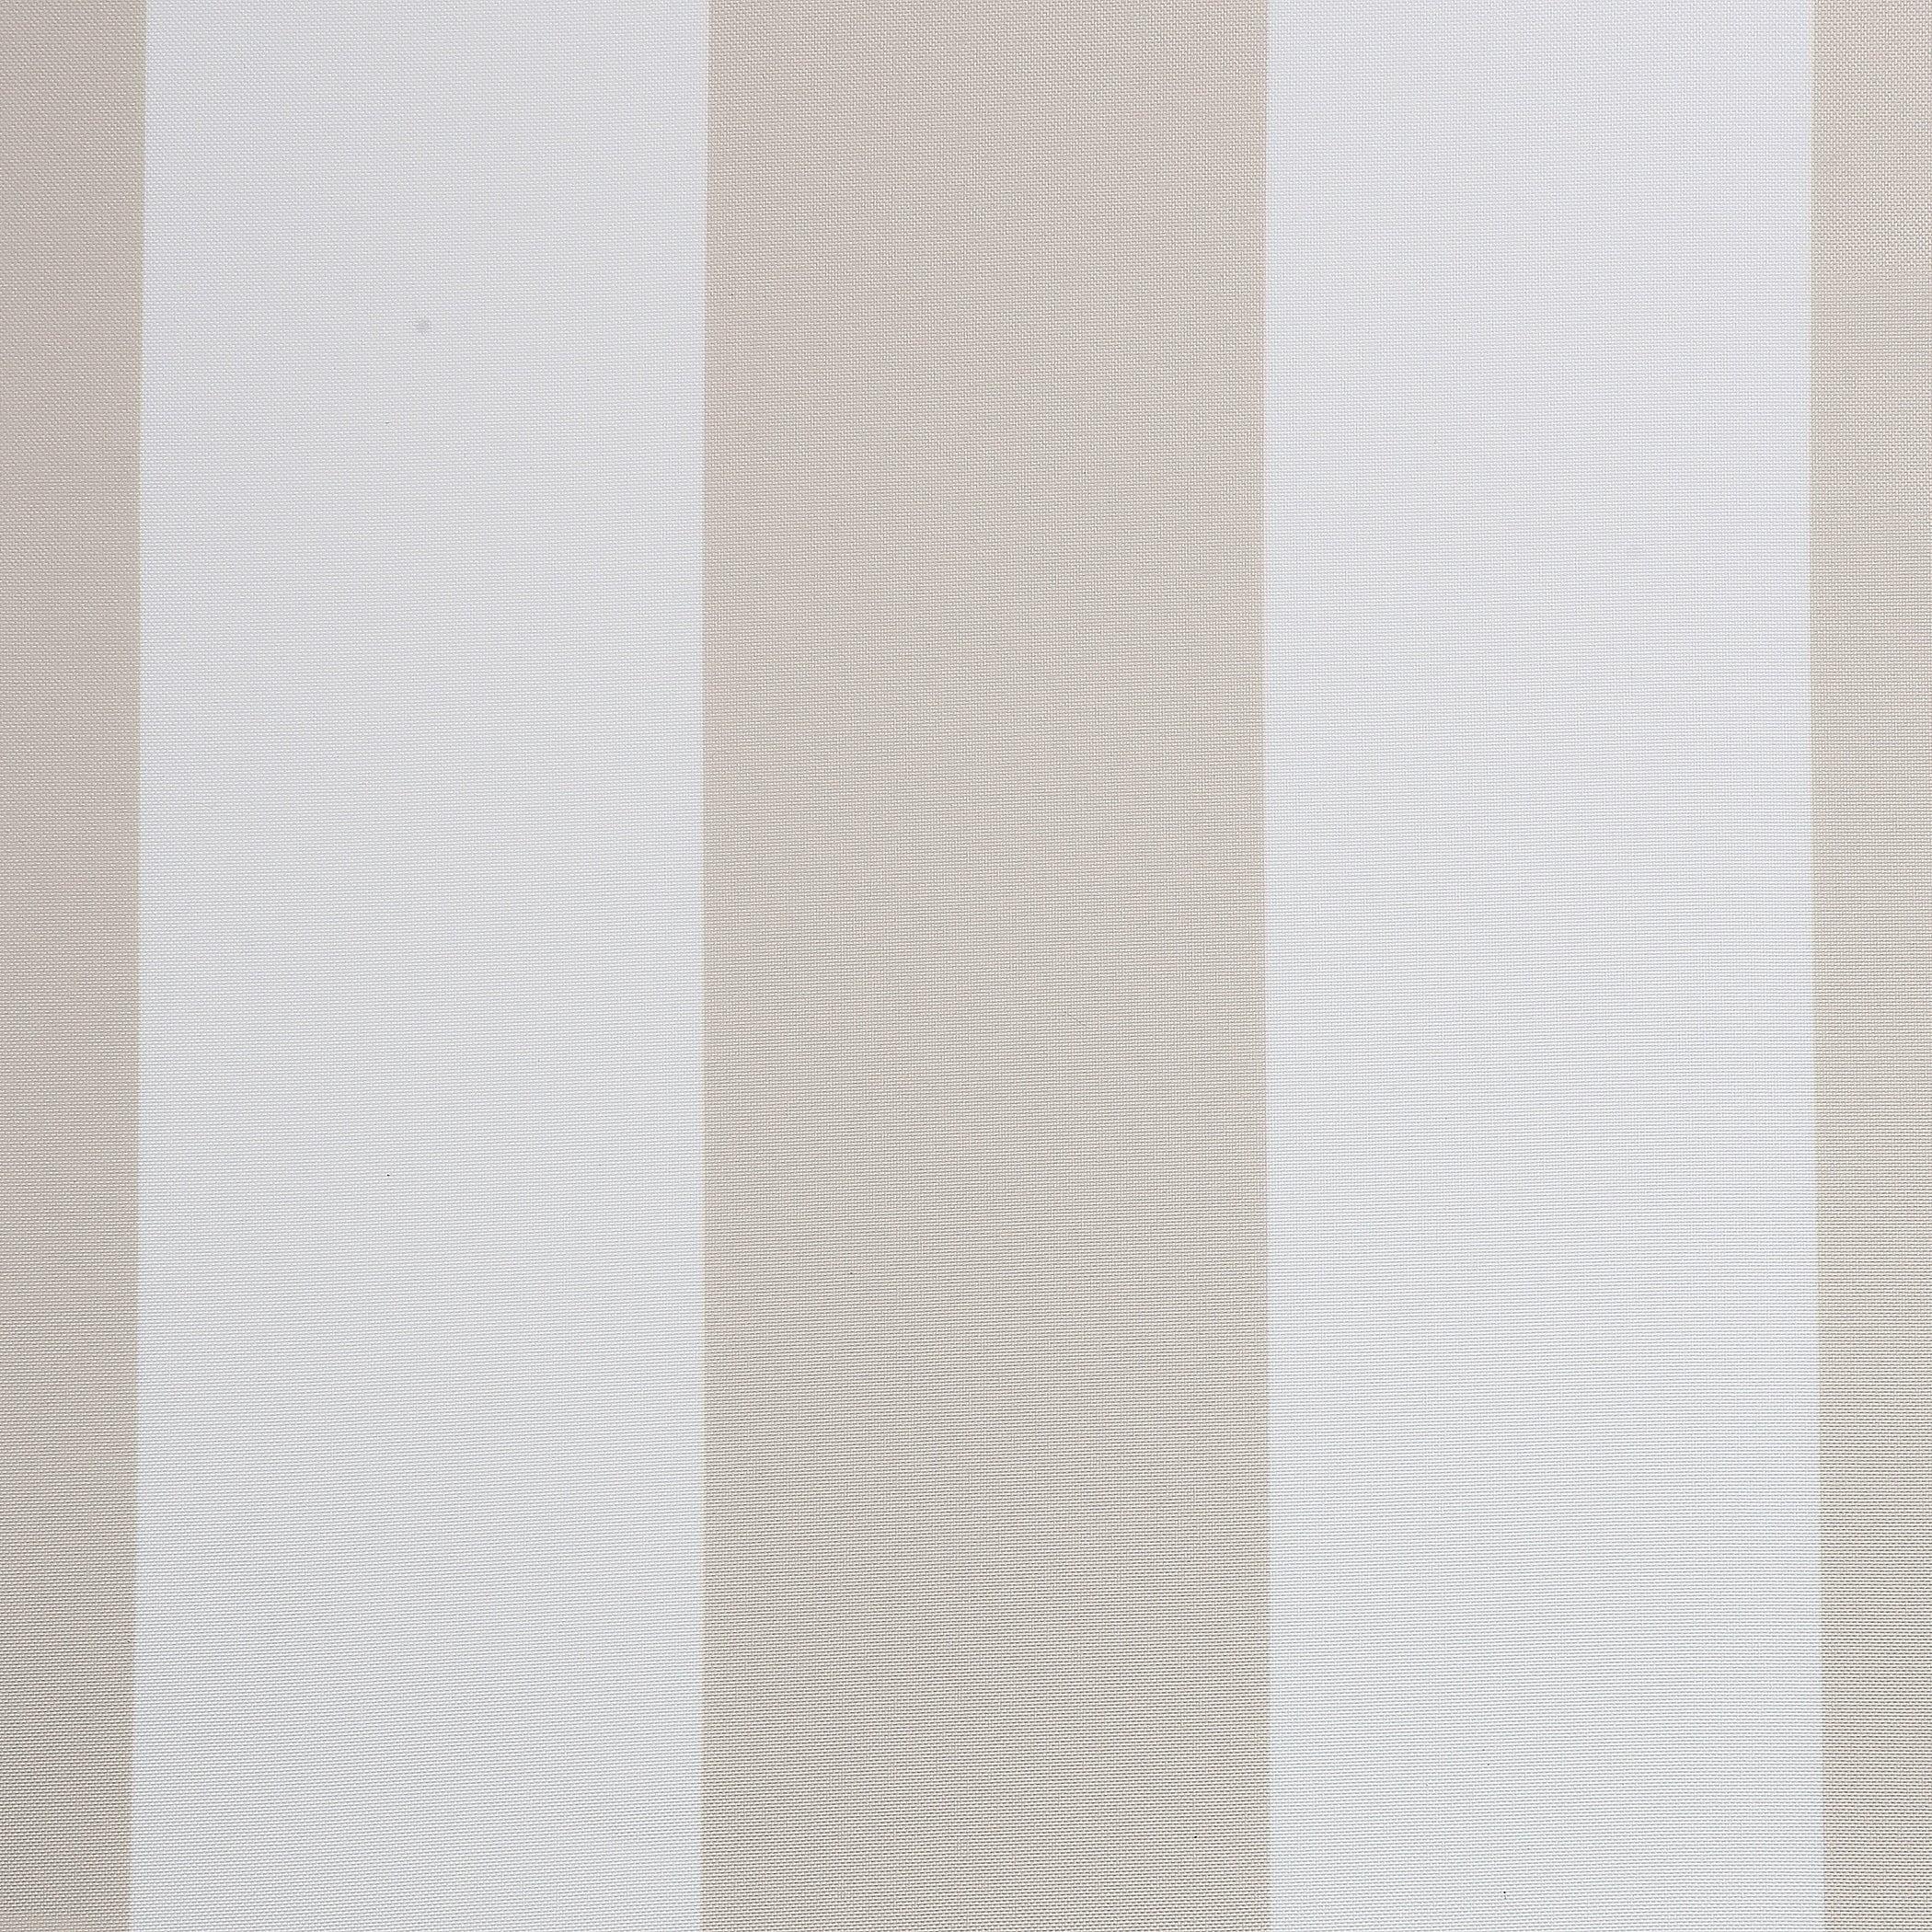 Sun Zero Valencia Cabana Stripe Indoor/outdoor Curtain Panel Regarding Valencia Cabana Stripe Indoor/outdoor Curtain Panels (View 12 of 30)